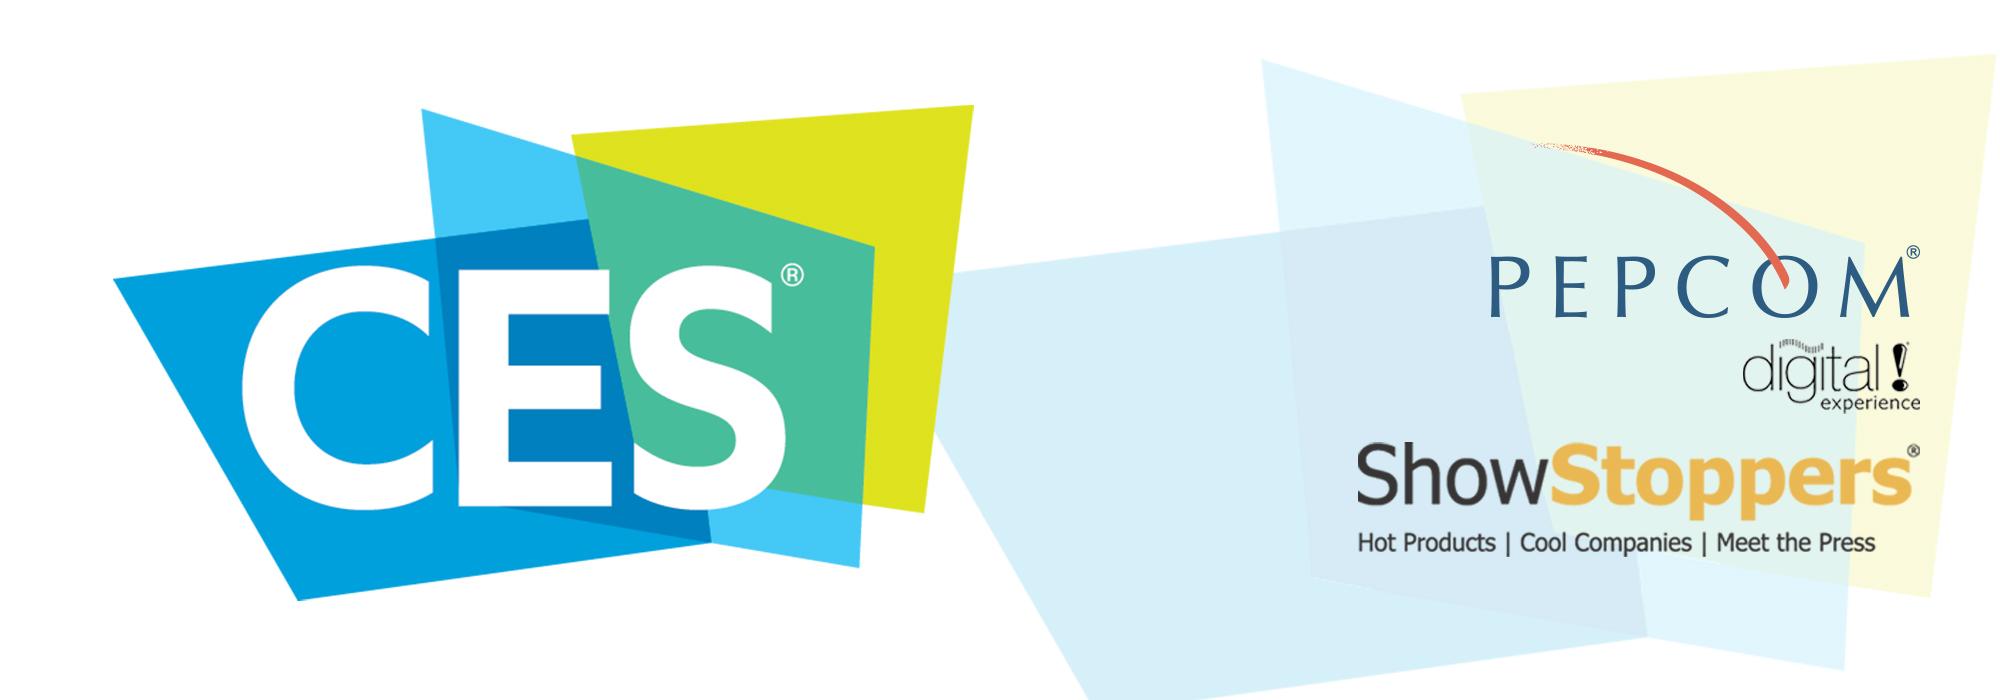 ViewSonic a lansat noi monitoare și videoproiectoare